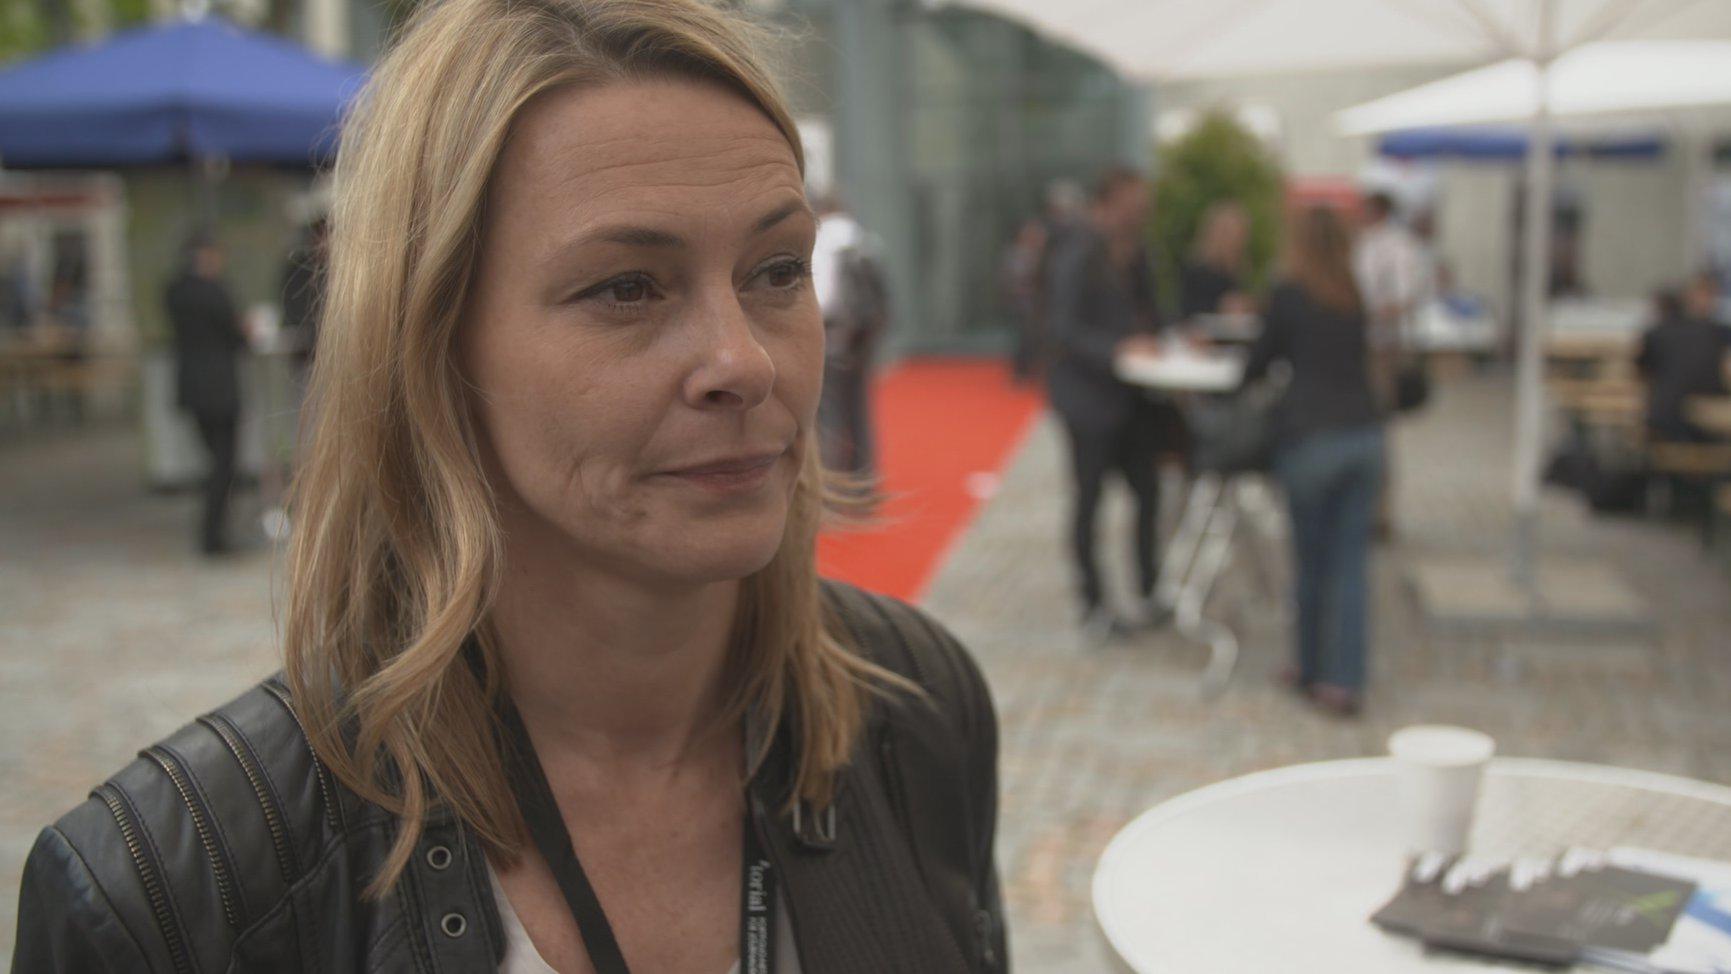 Interview: Anja Reschke über den Umgang mit Populisten